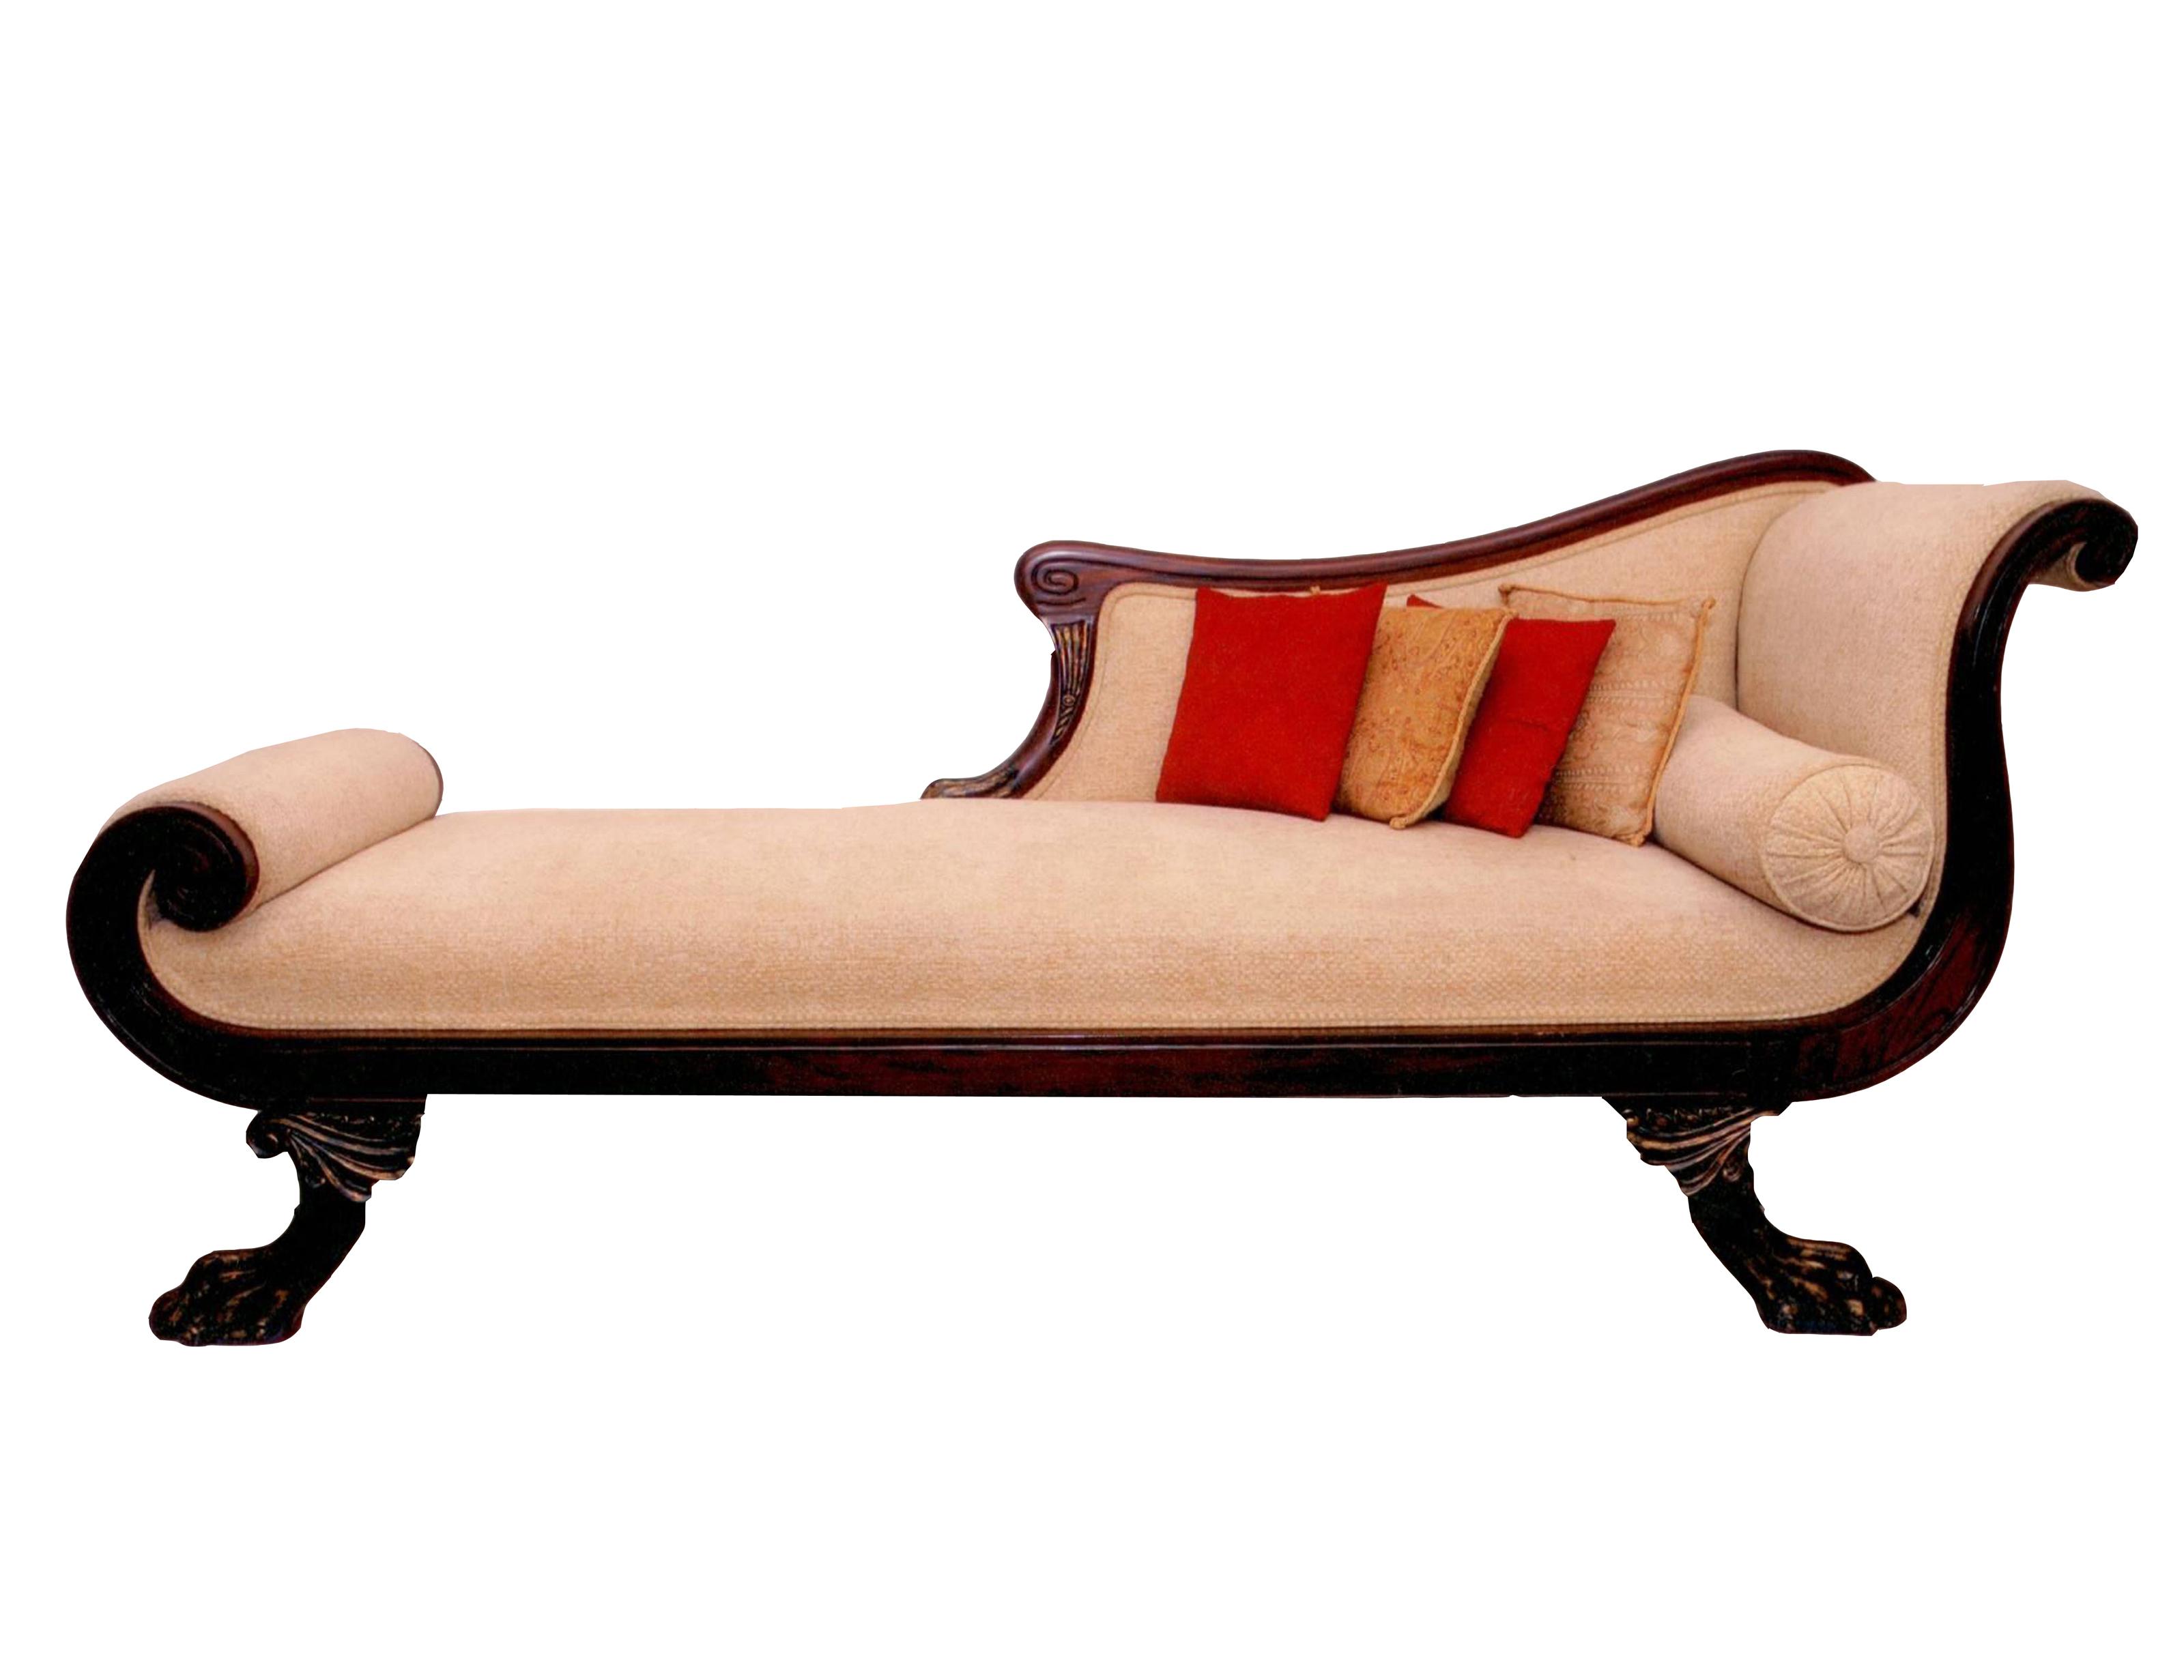 leather sofa repair bangalore sofas tulsa chaise lounge india  review home decor